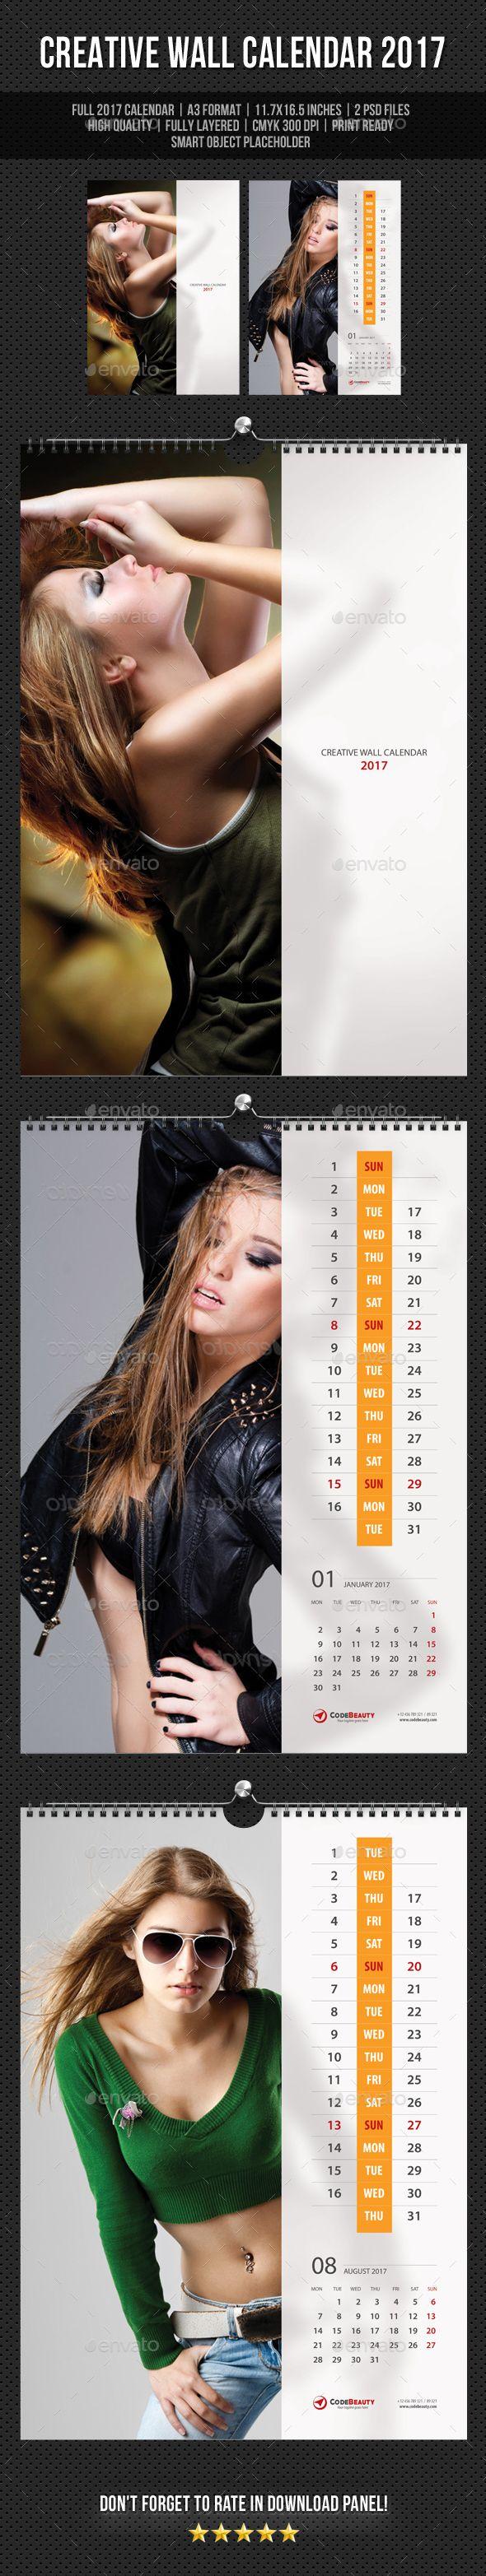 Creative Wall Calendar 2017 V12